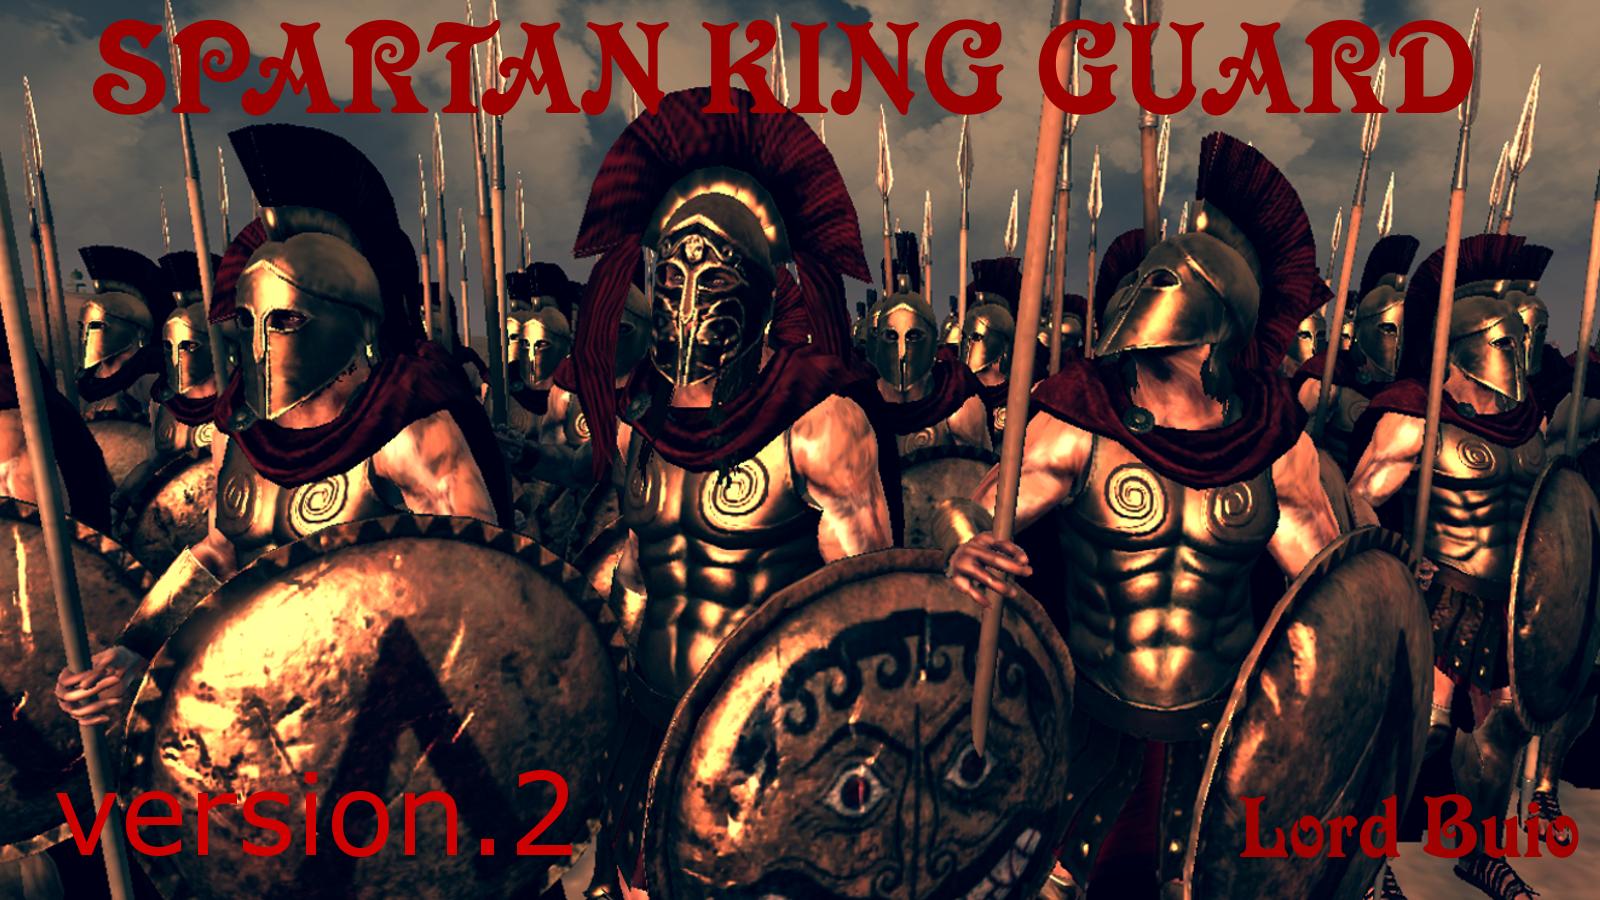 Spartan King Guard OPv.